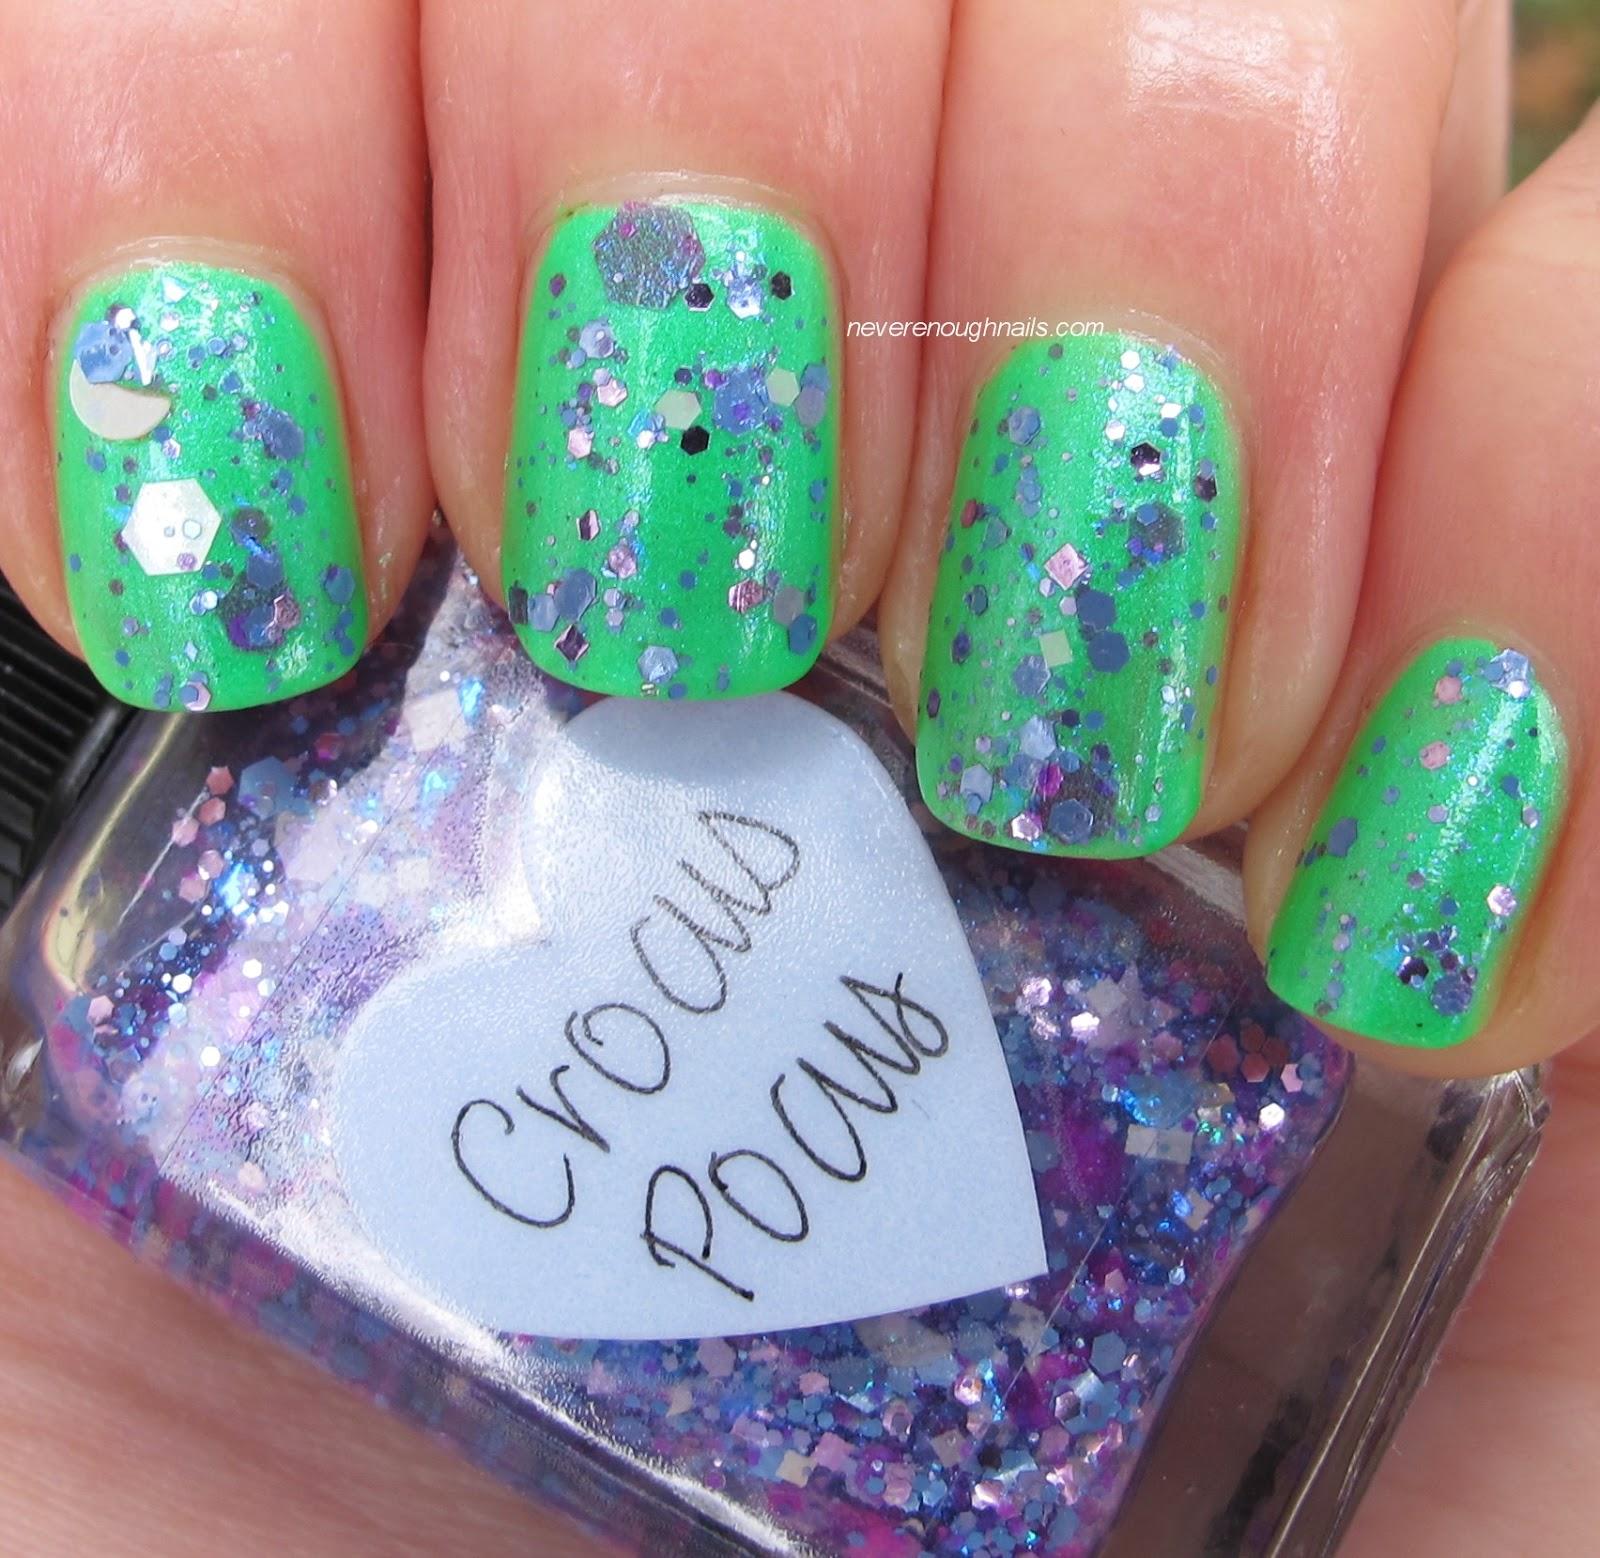 Never Enough Nails: Lynnderella Crocus Pocus and Tres Chic, Duckie Dear